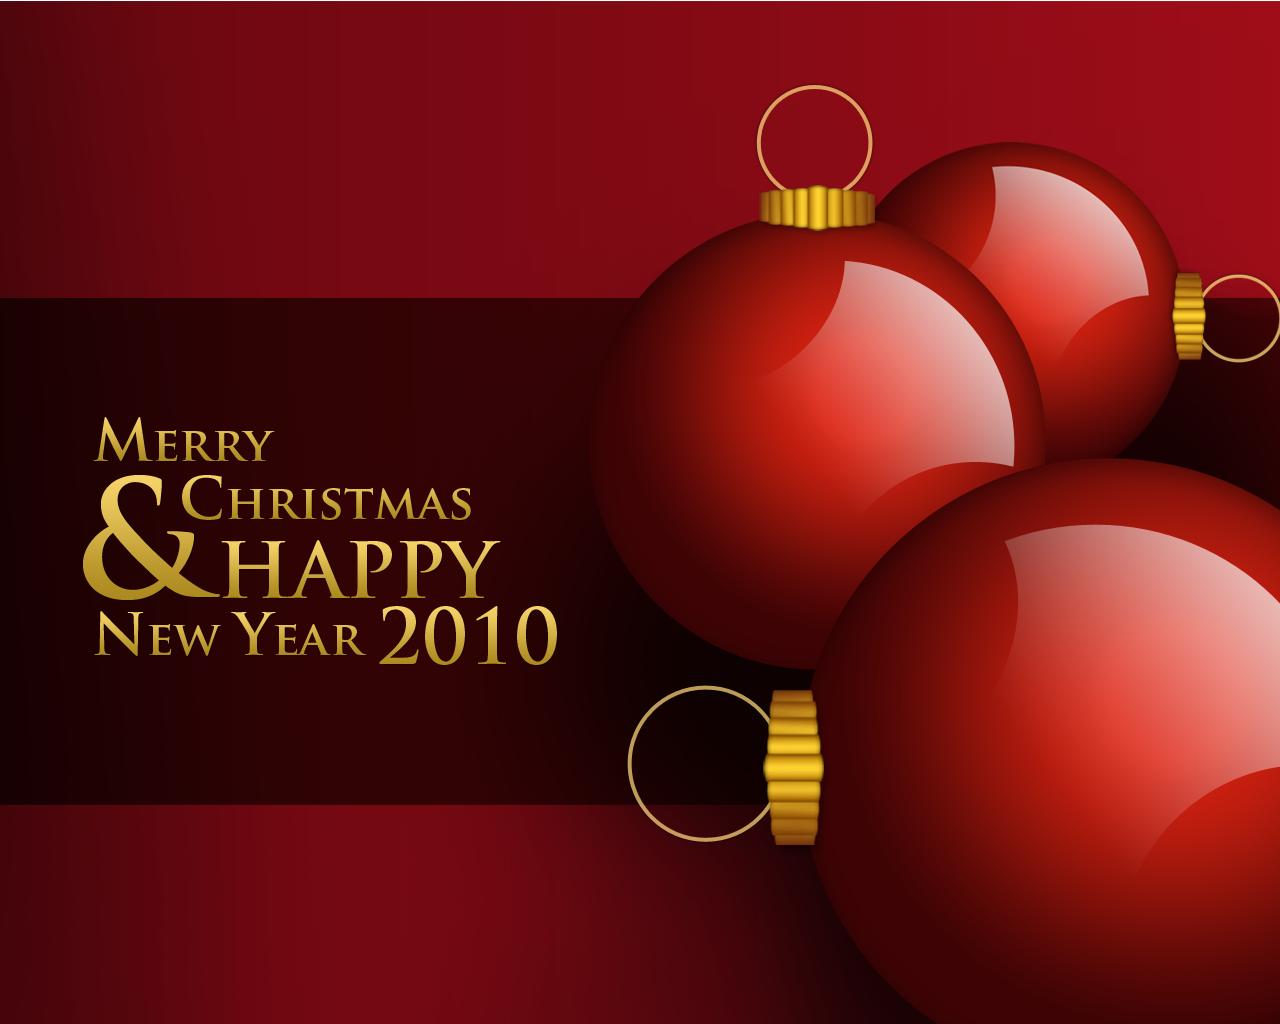 Index of /content_images/Freebies/wallpaper-calendar-december-09